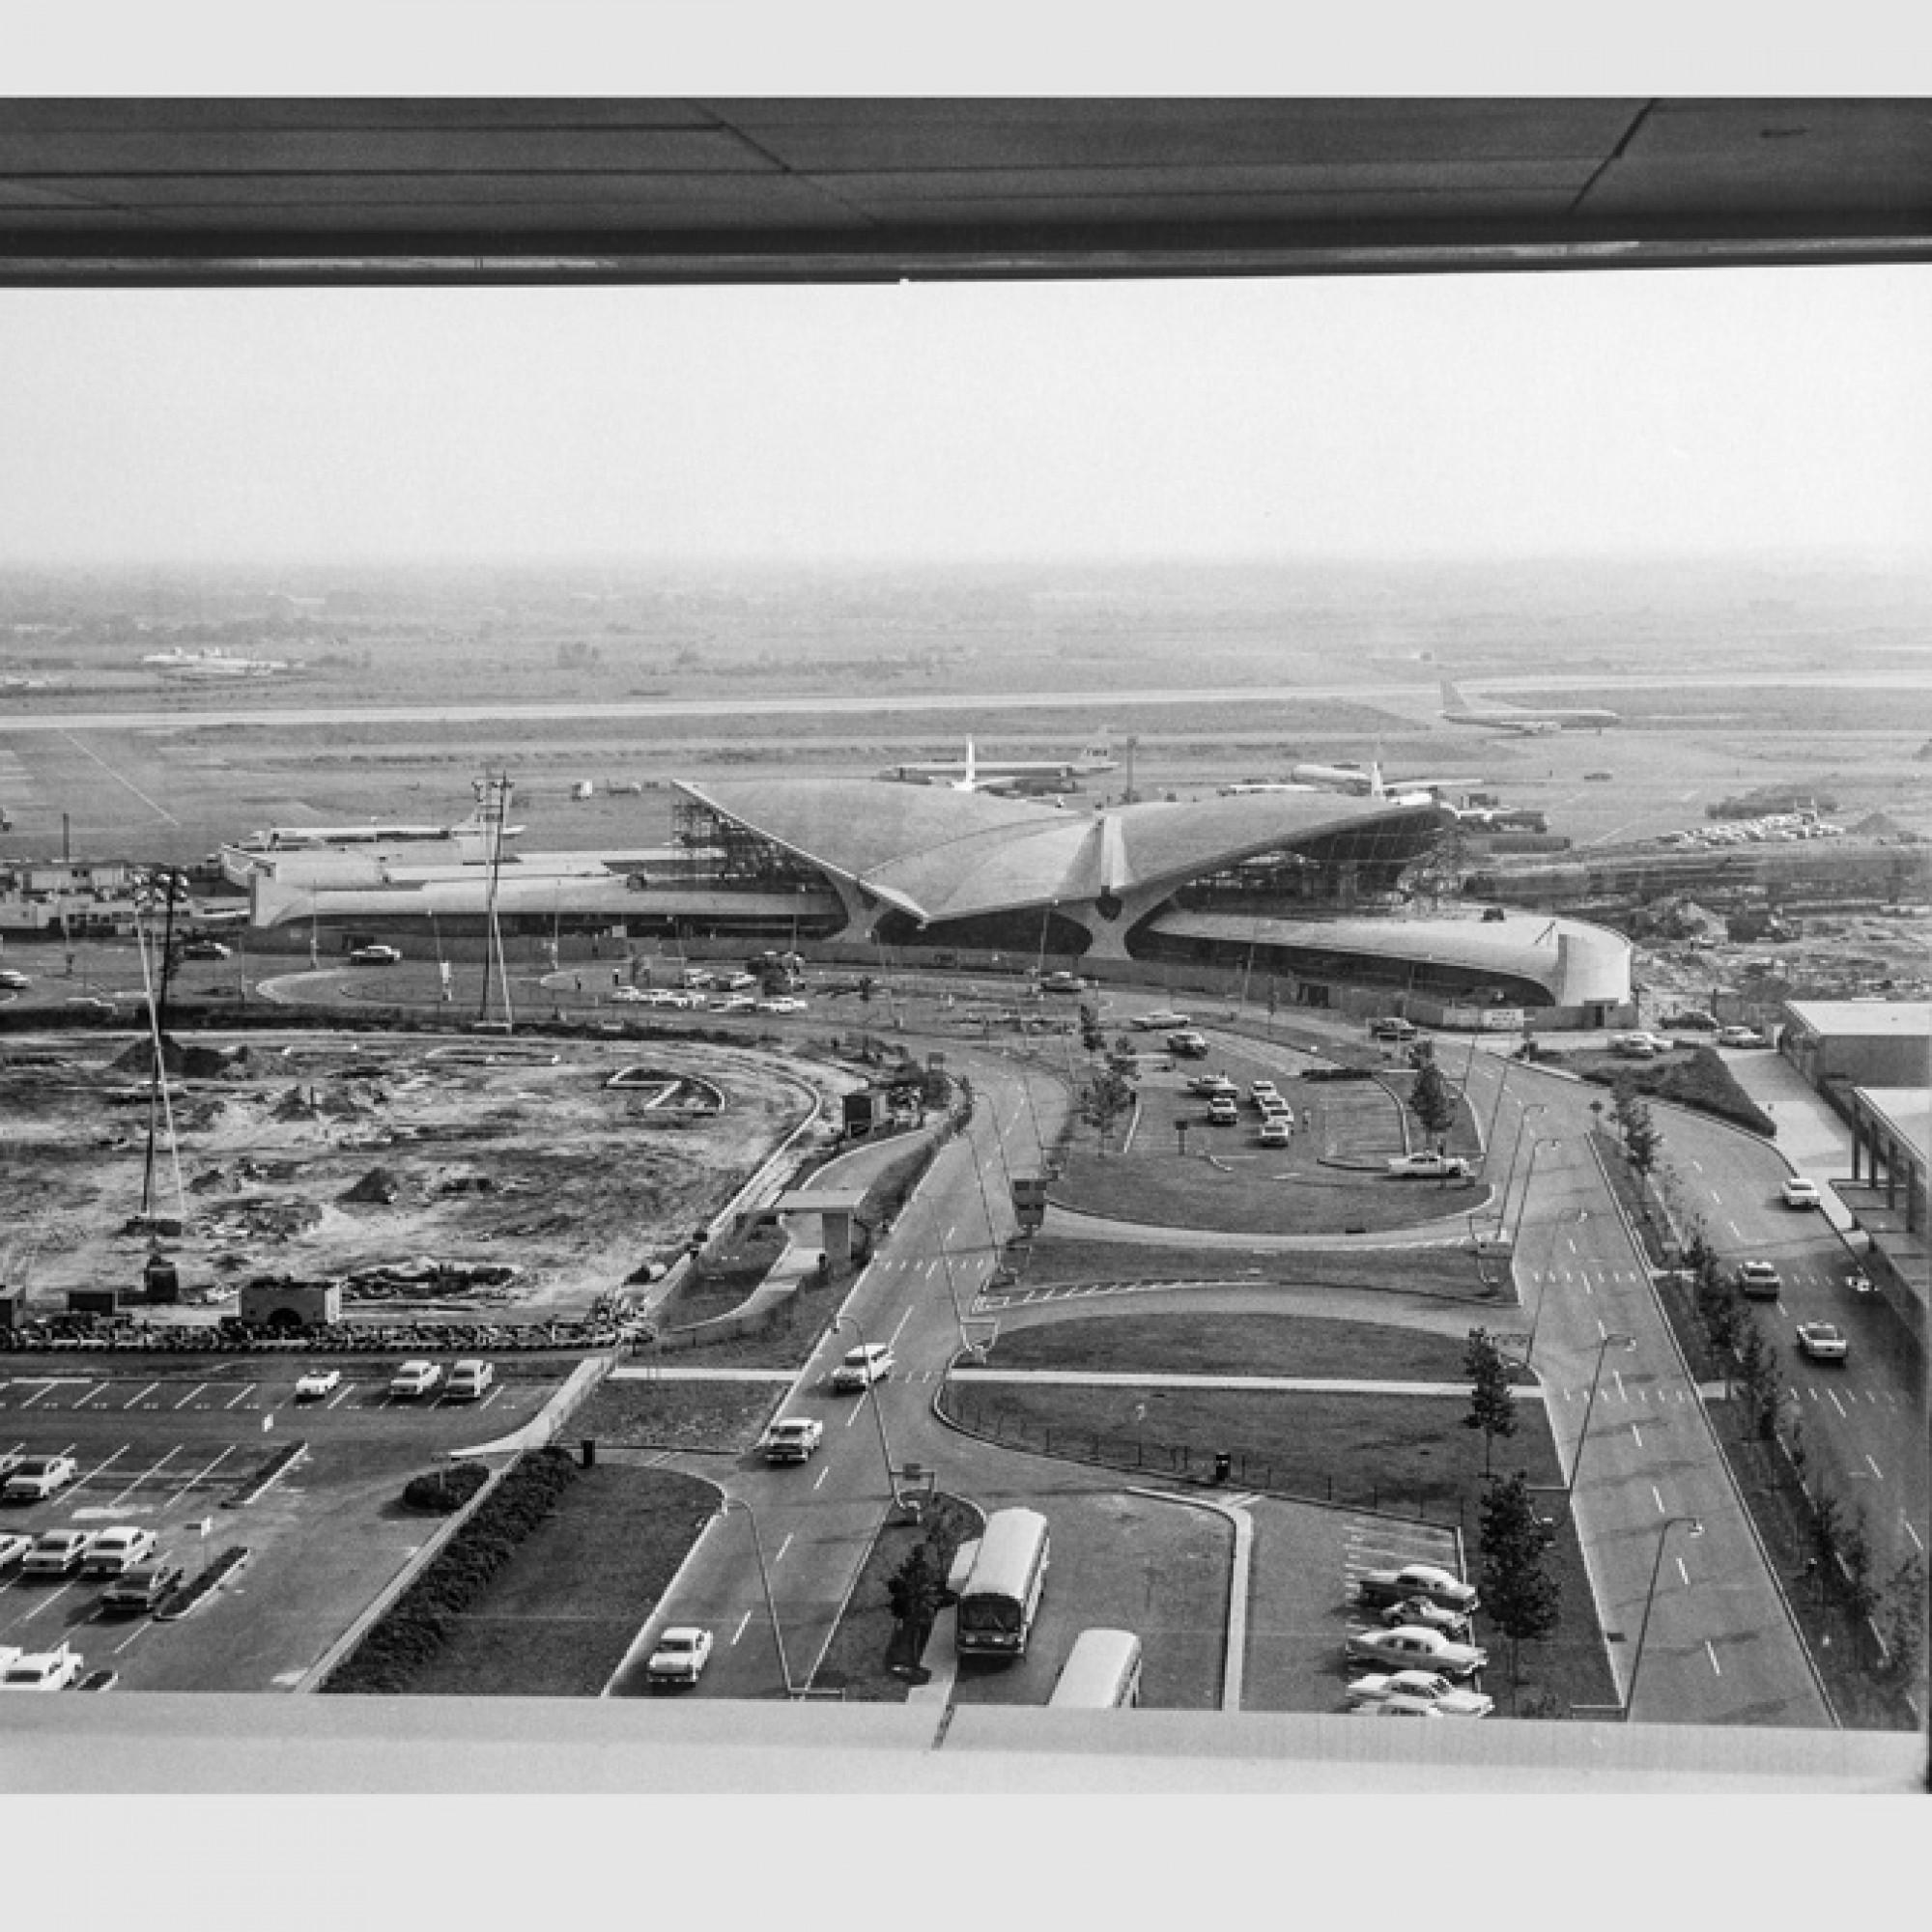 TWA Flughafenterminal, circa 1961 © Dan Page / Eero Saarinen Collection (MS 593). Manuscripts and Archives, Yale University Library 1/9